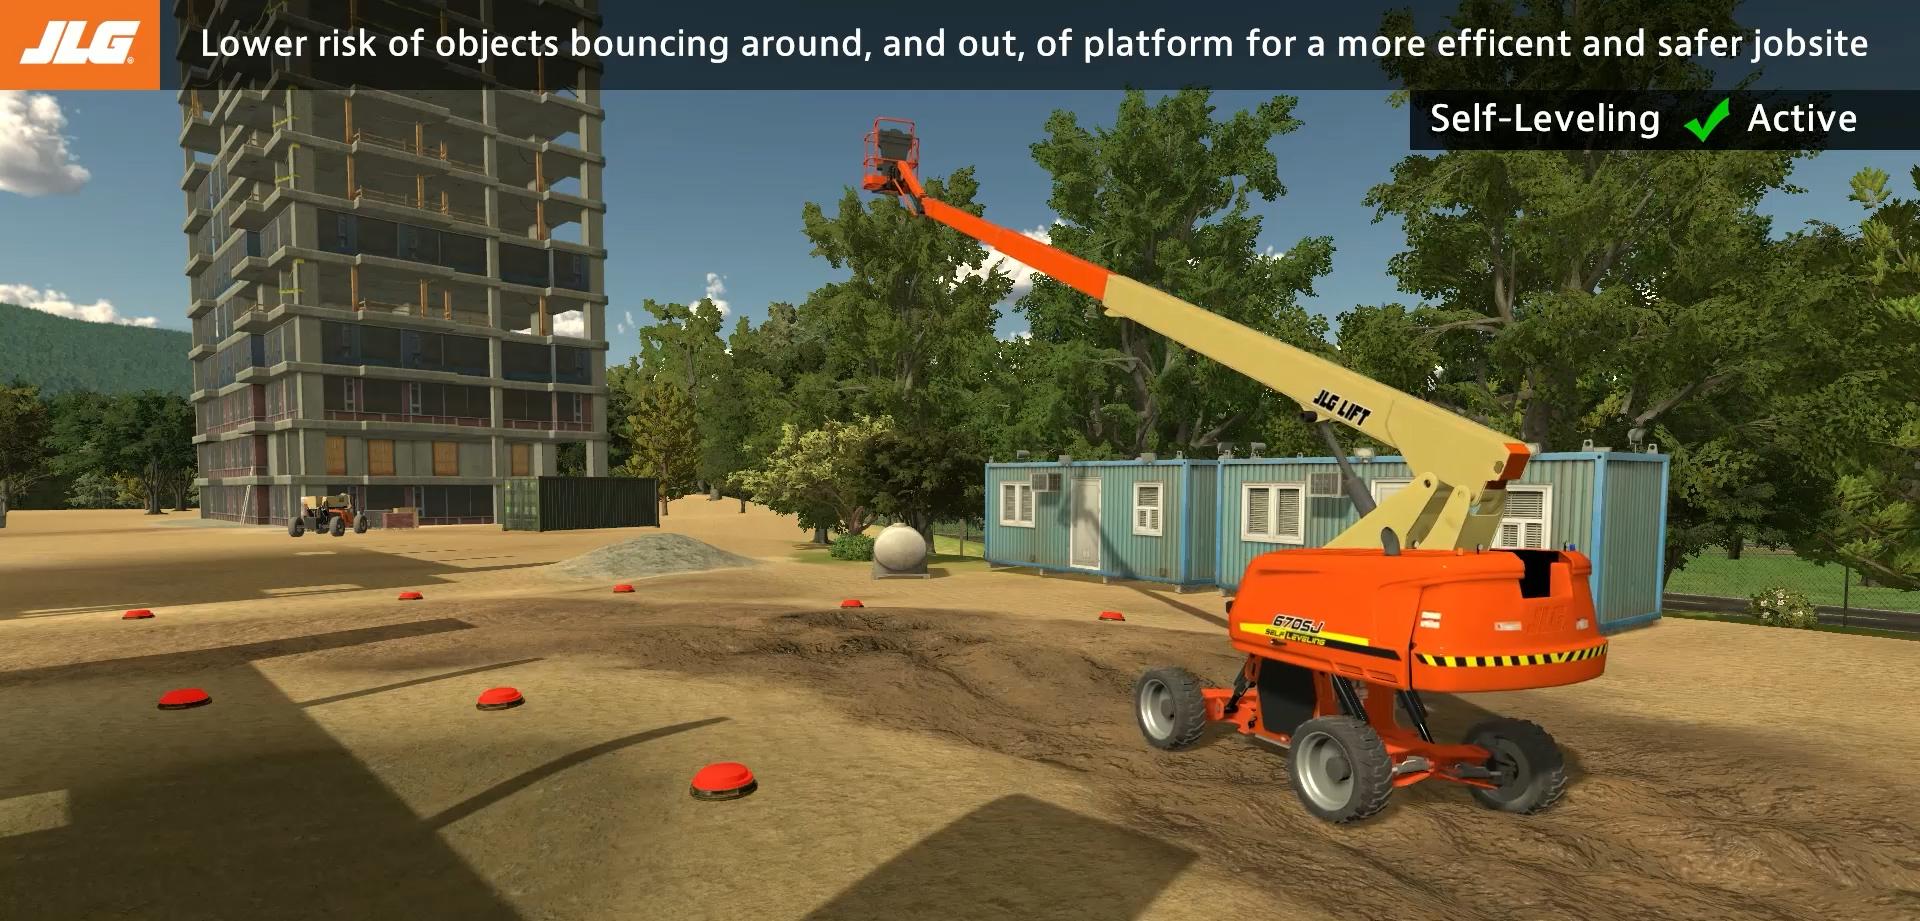 JLG Self-Leveling Boom Lift Training Simulator by ForgeFX Simulations